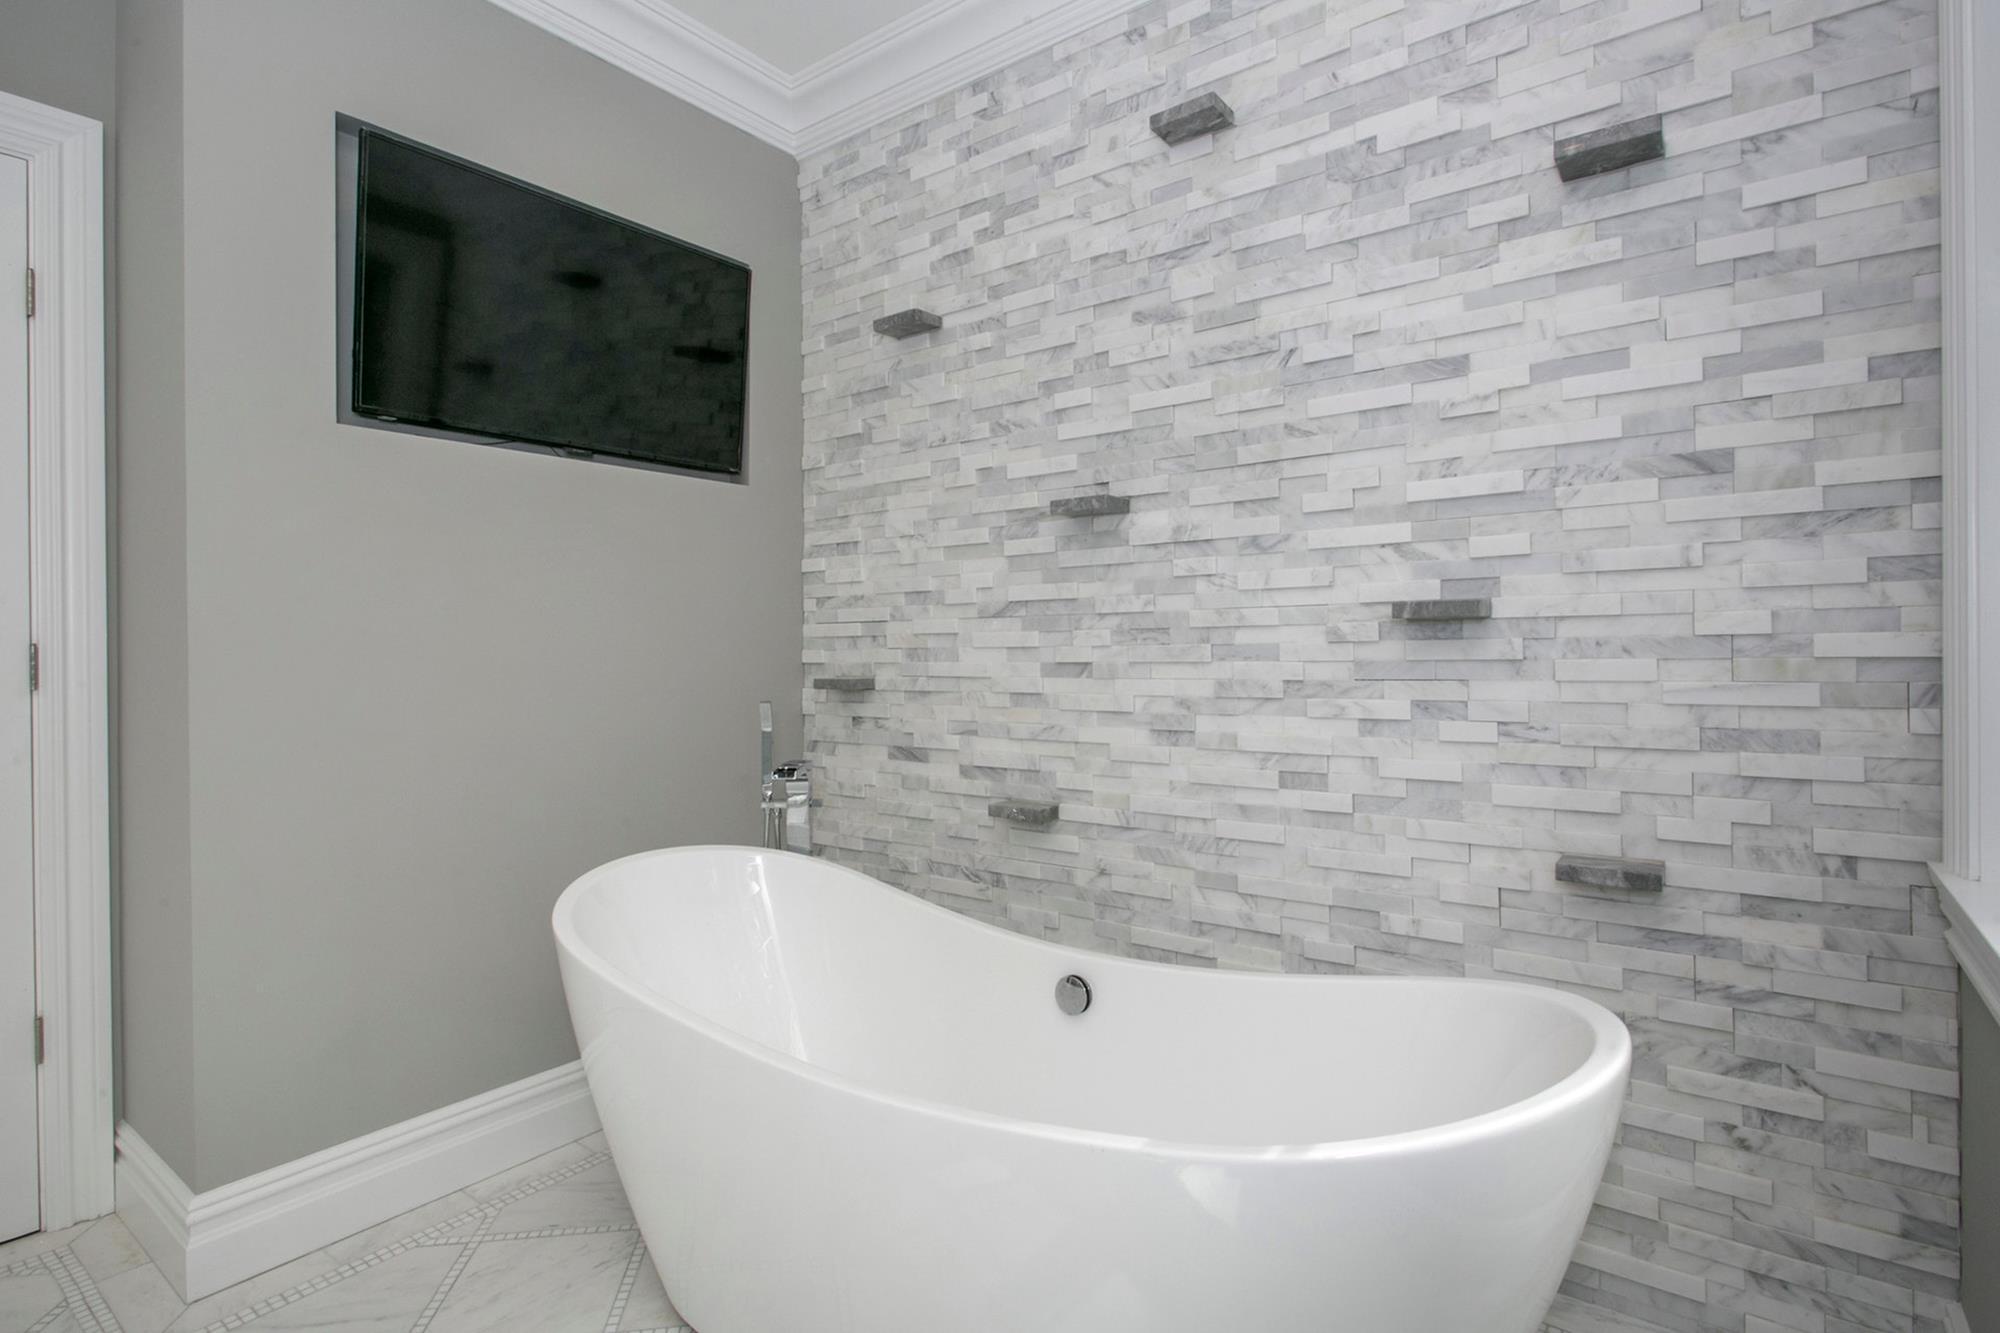 ESTATE AREA: Newly Built 4-Bd. Shingle-Style House w/ Decks & Majestic River Views on Private Cul-de-Sac